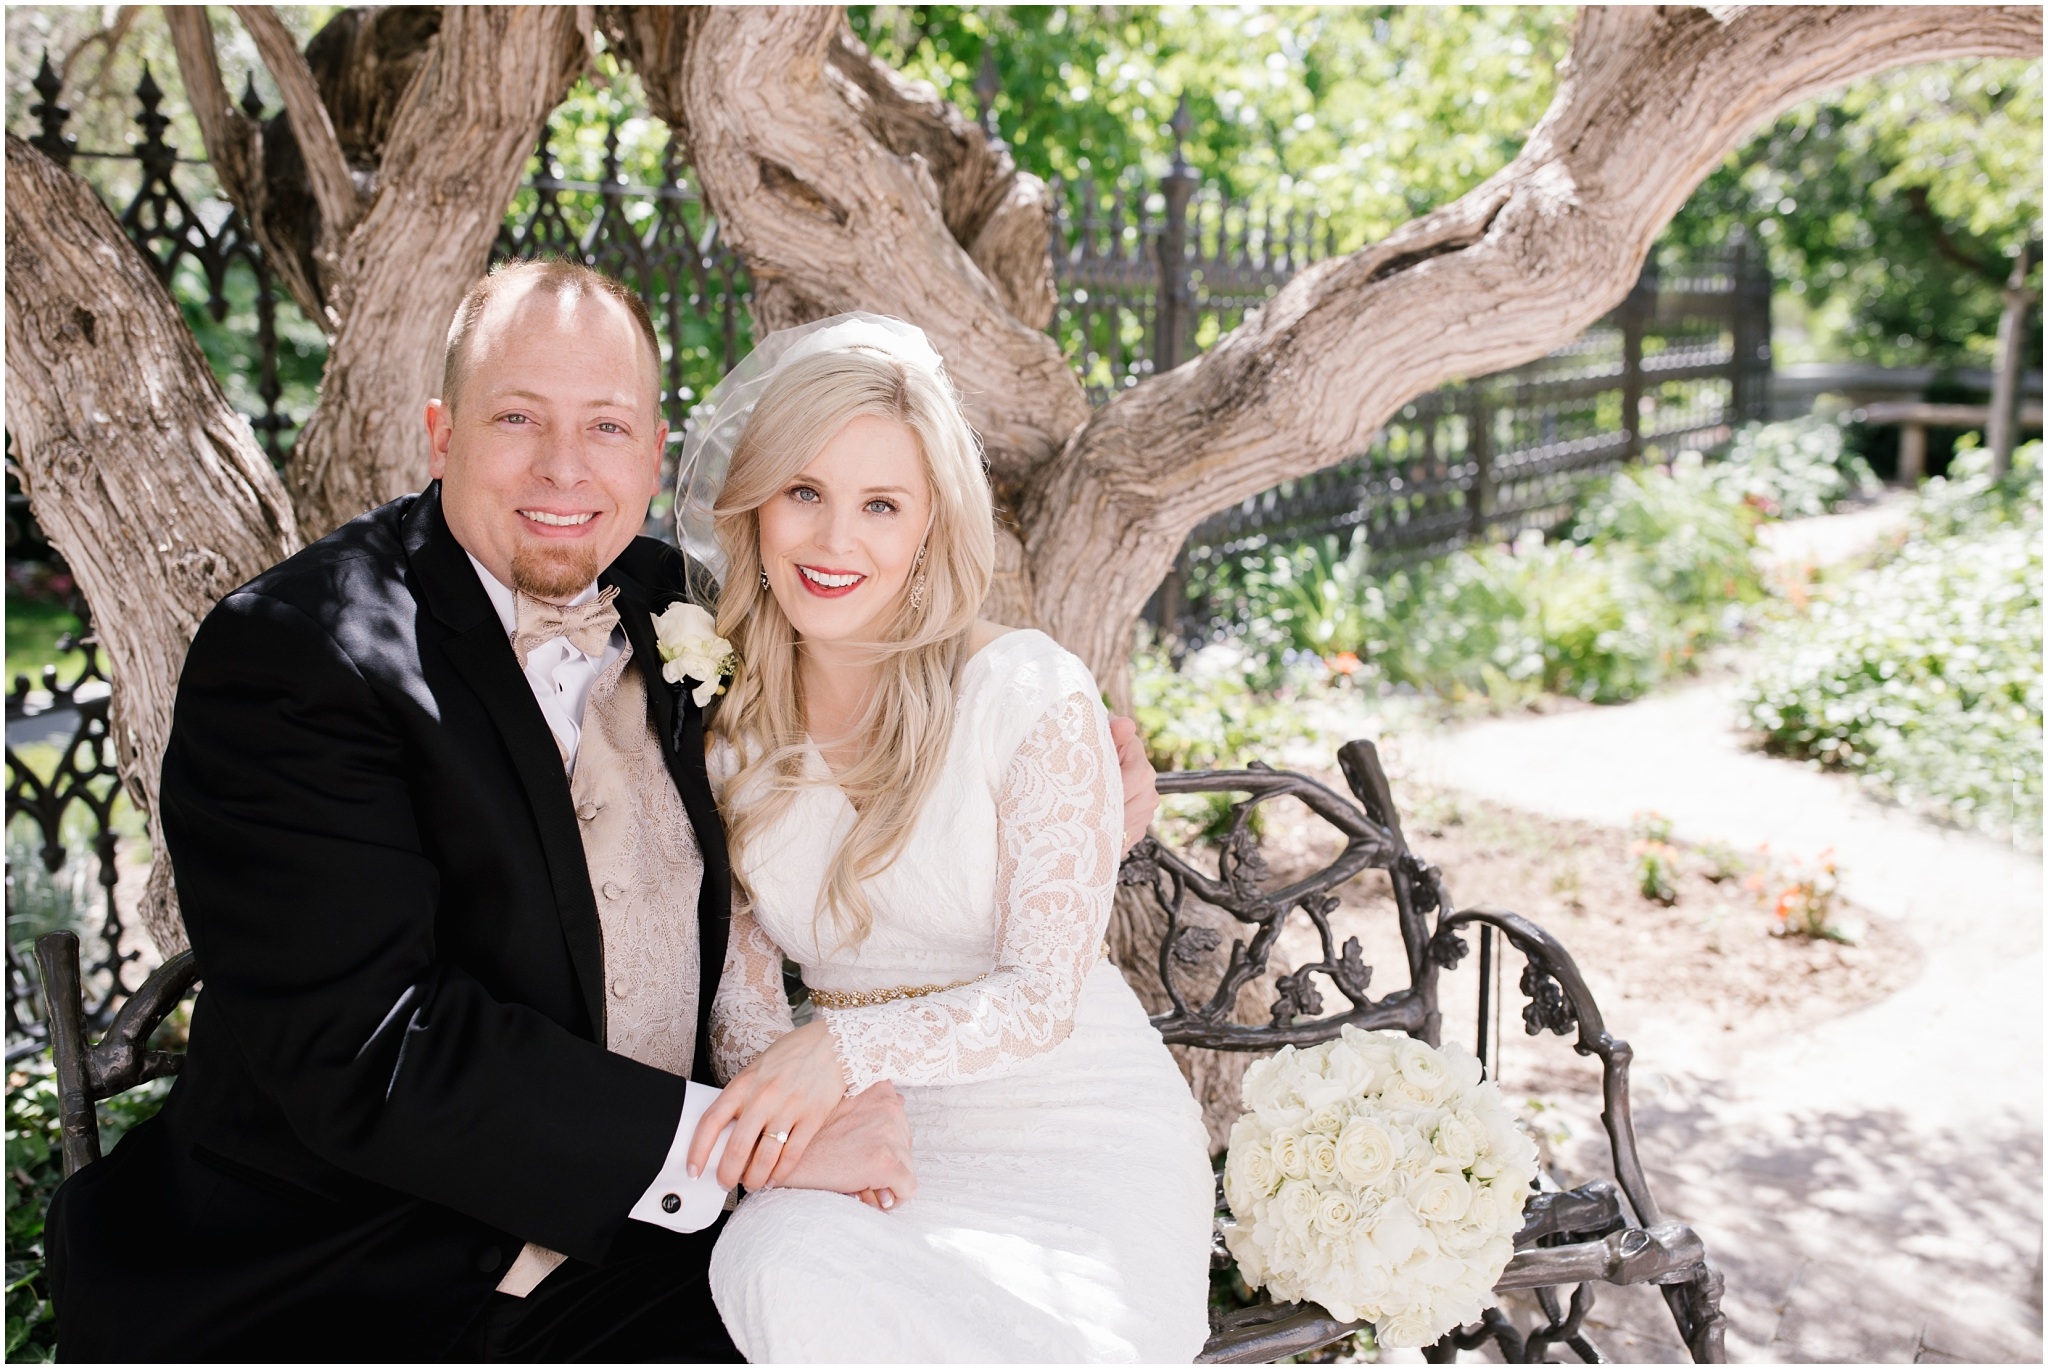 CherylandTyler-194_Lizzie-B-Imagery-Utah-Wedding-Photographer-Salt-Lake-City-Temple-Wells-Fargo-Building-Reception.jpg